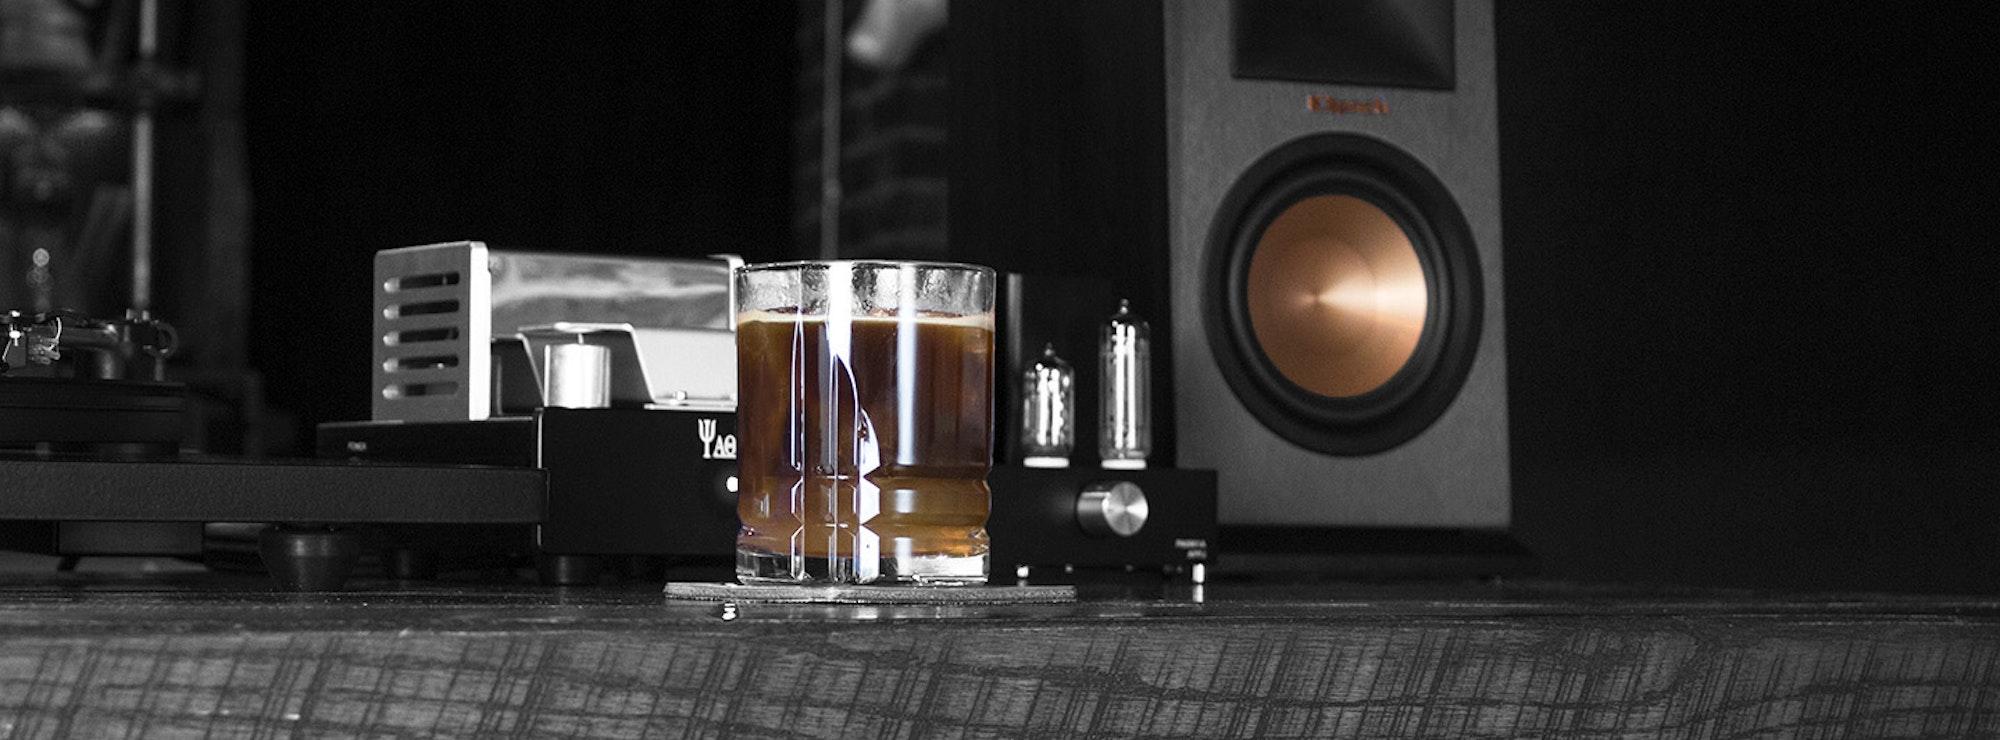 Klipsch bookshelf speaker and U-Turn turntable near a bar